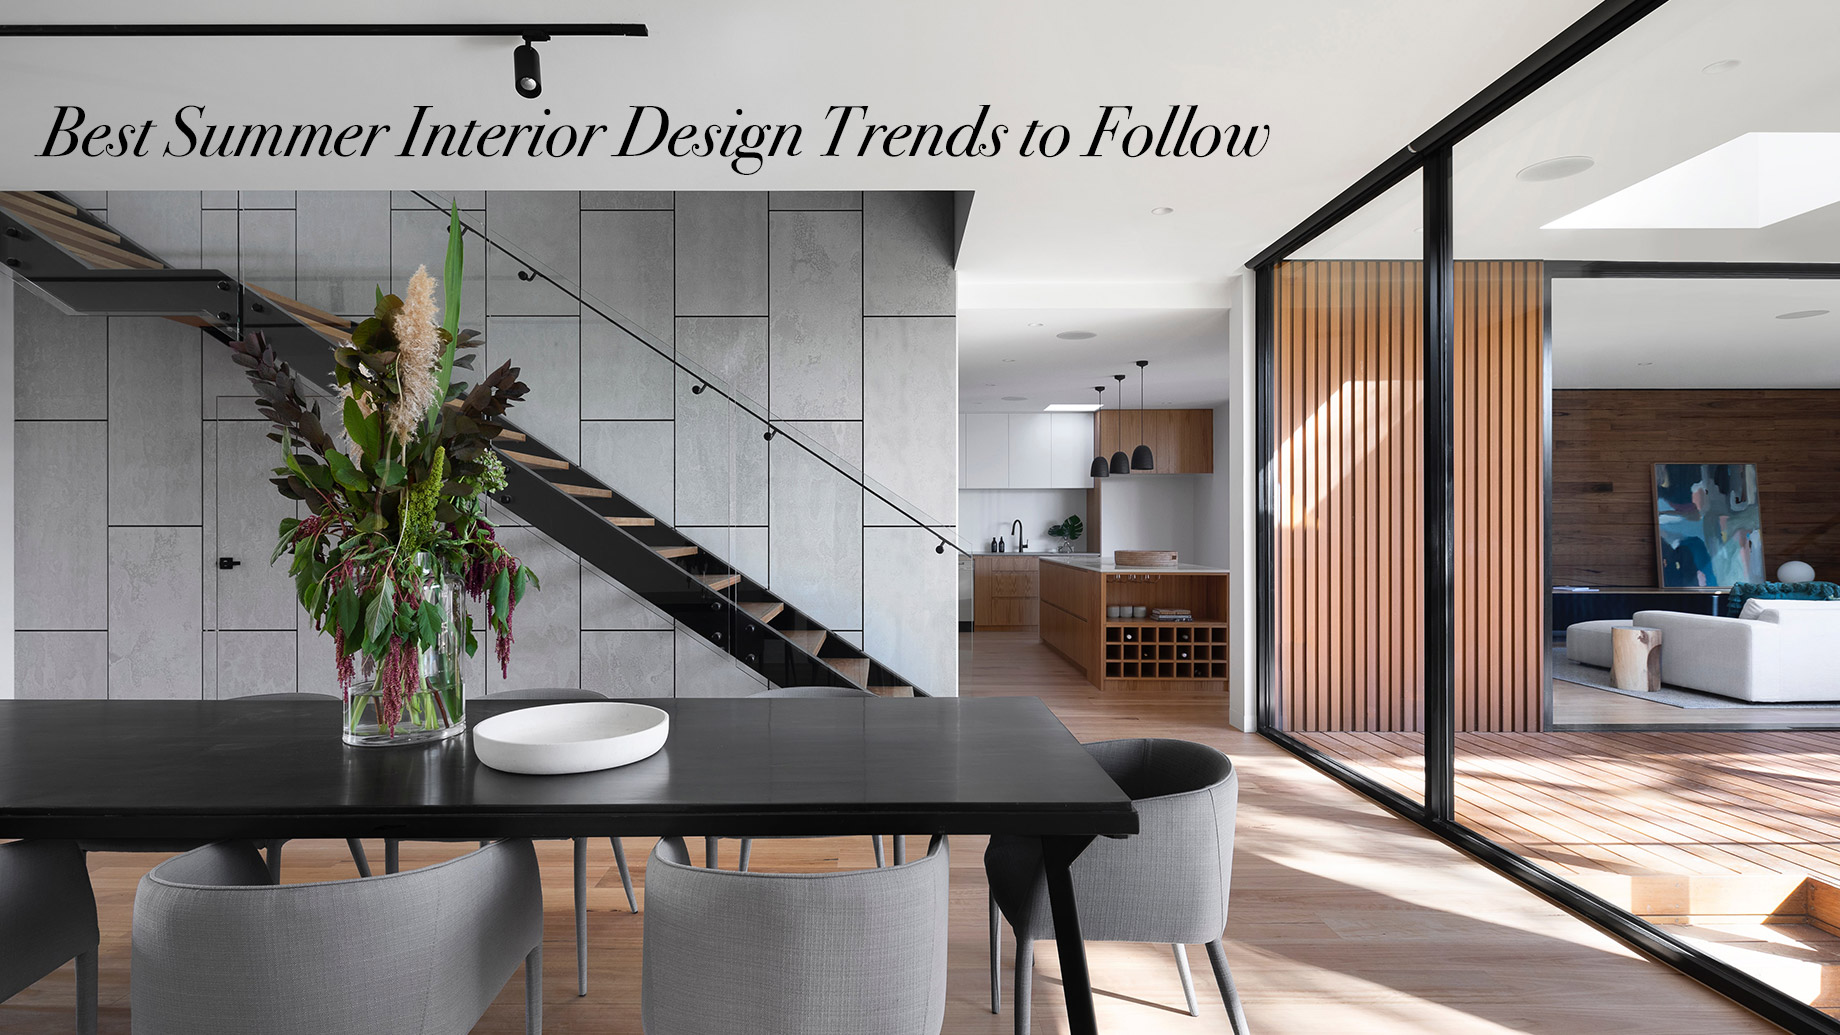 Best Summer Interior Design Trends to Follow